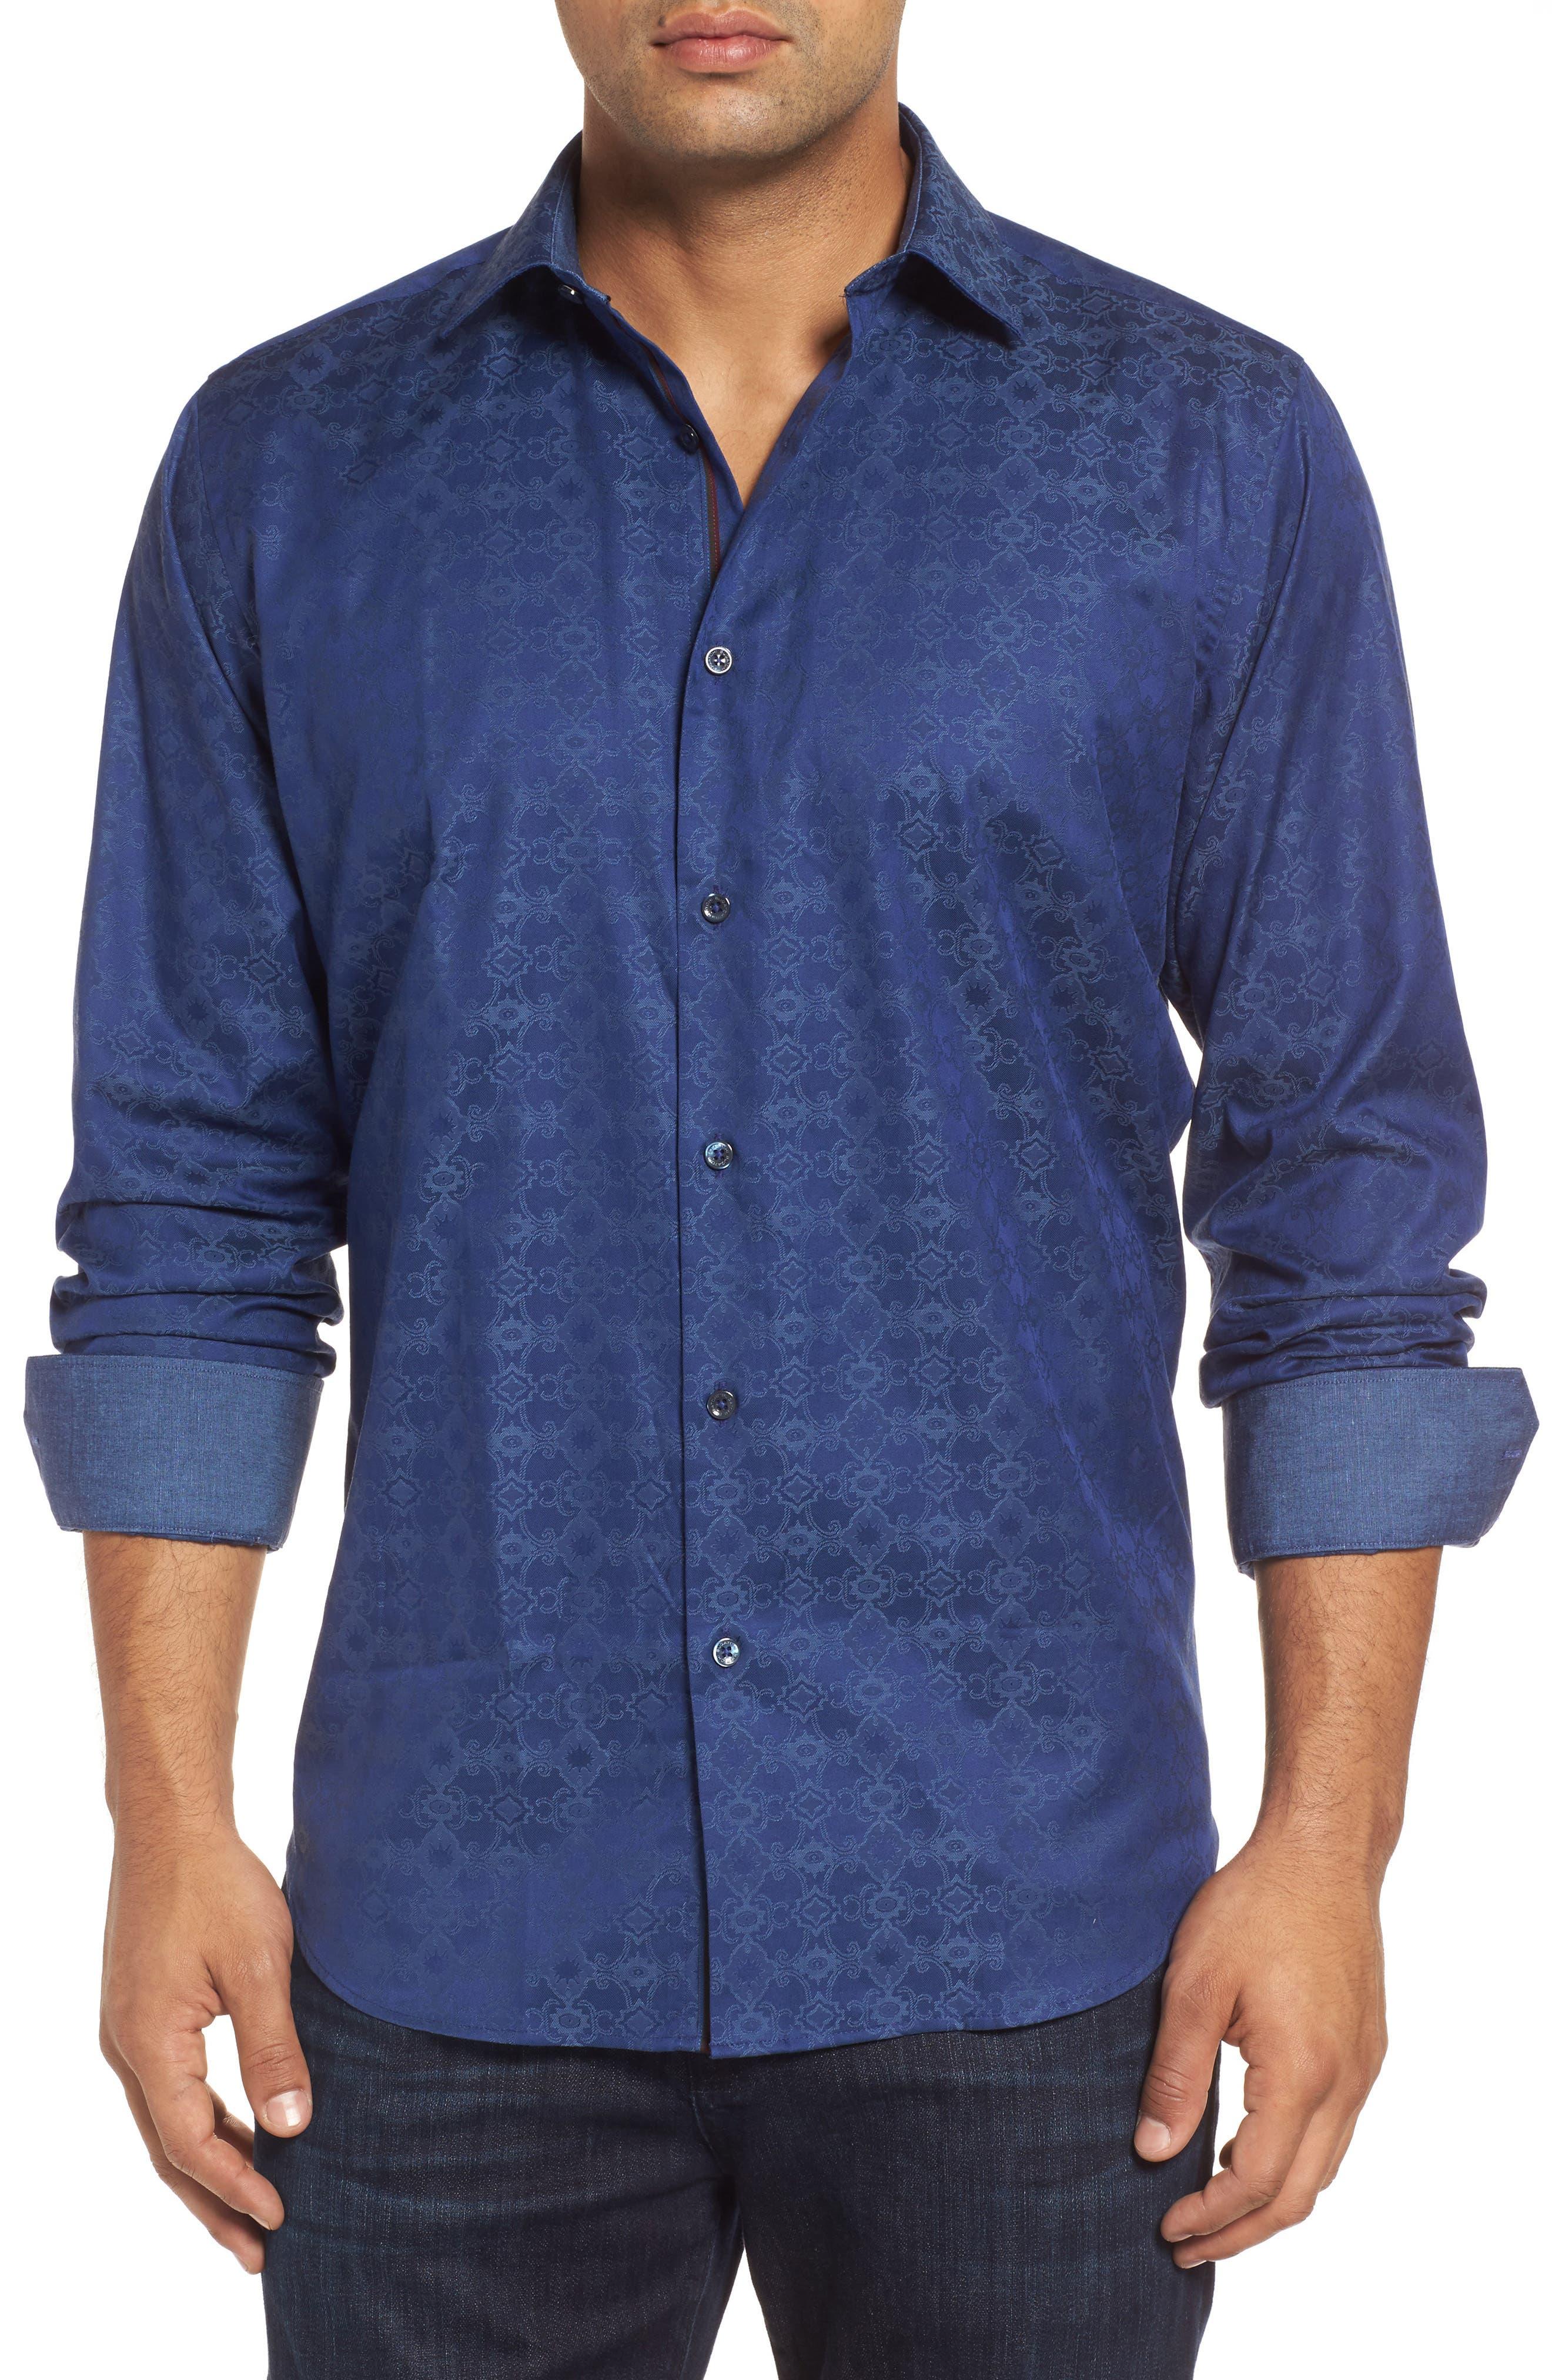 Main Image - Bugatchi Classic Fit Filigree Jacquard Sport Shirt